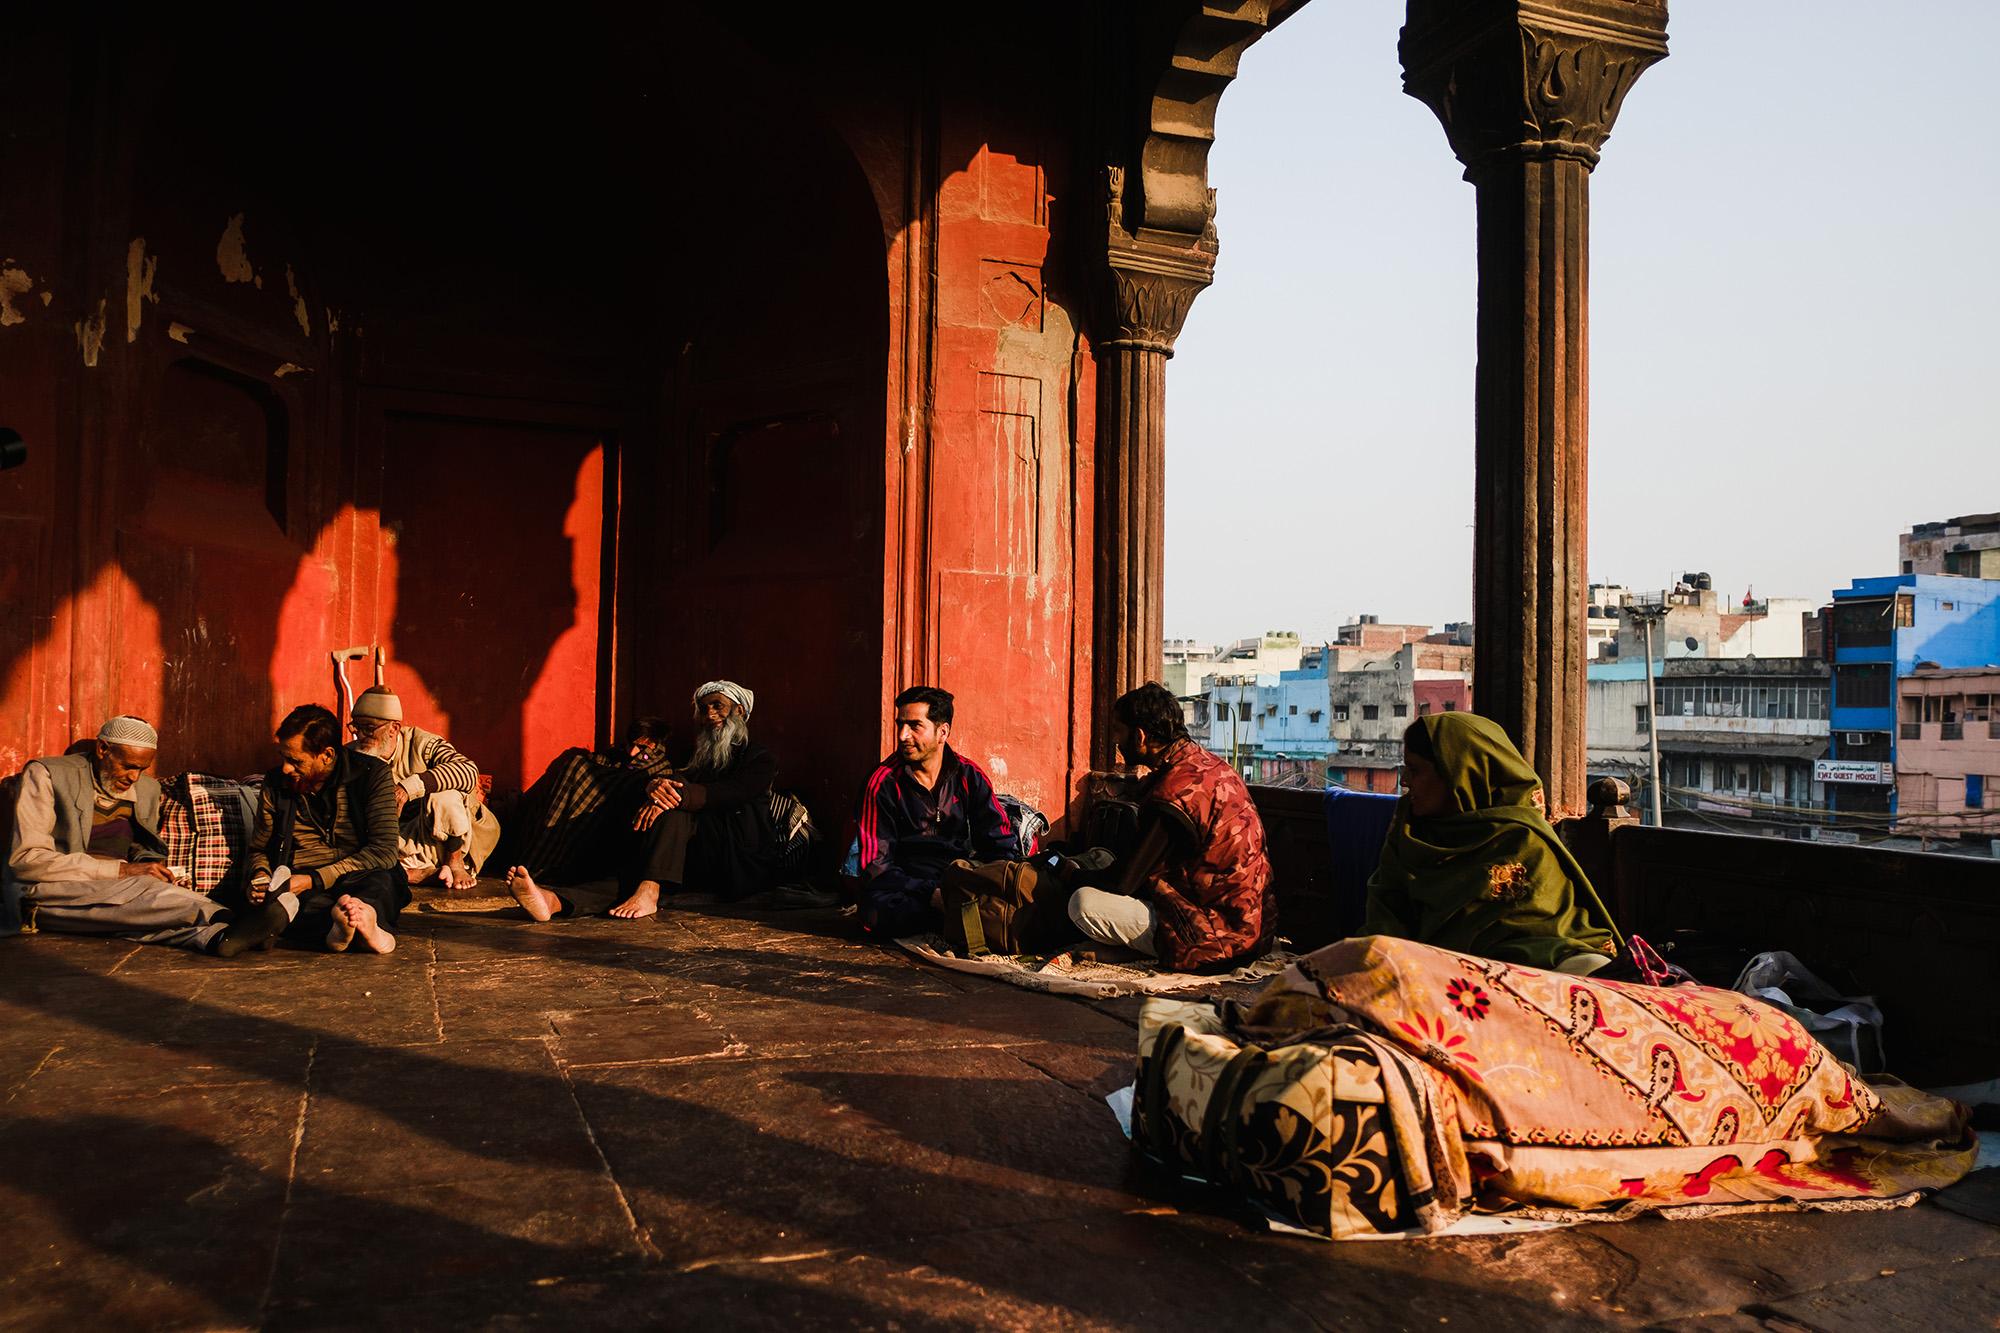 AnjaPoehlmann_India-Delhi_010.jpg